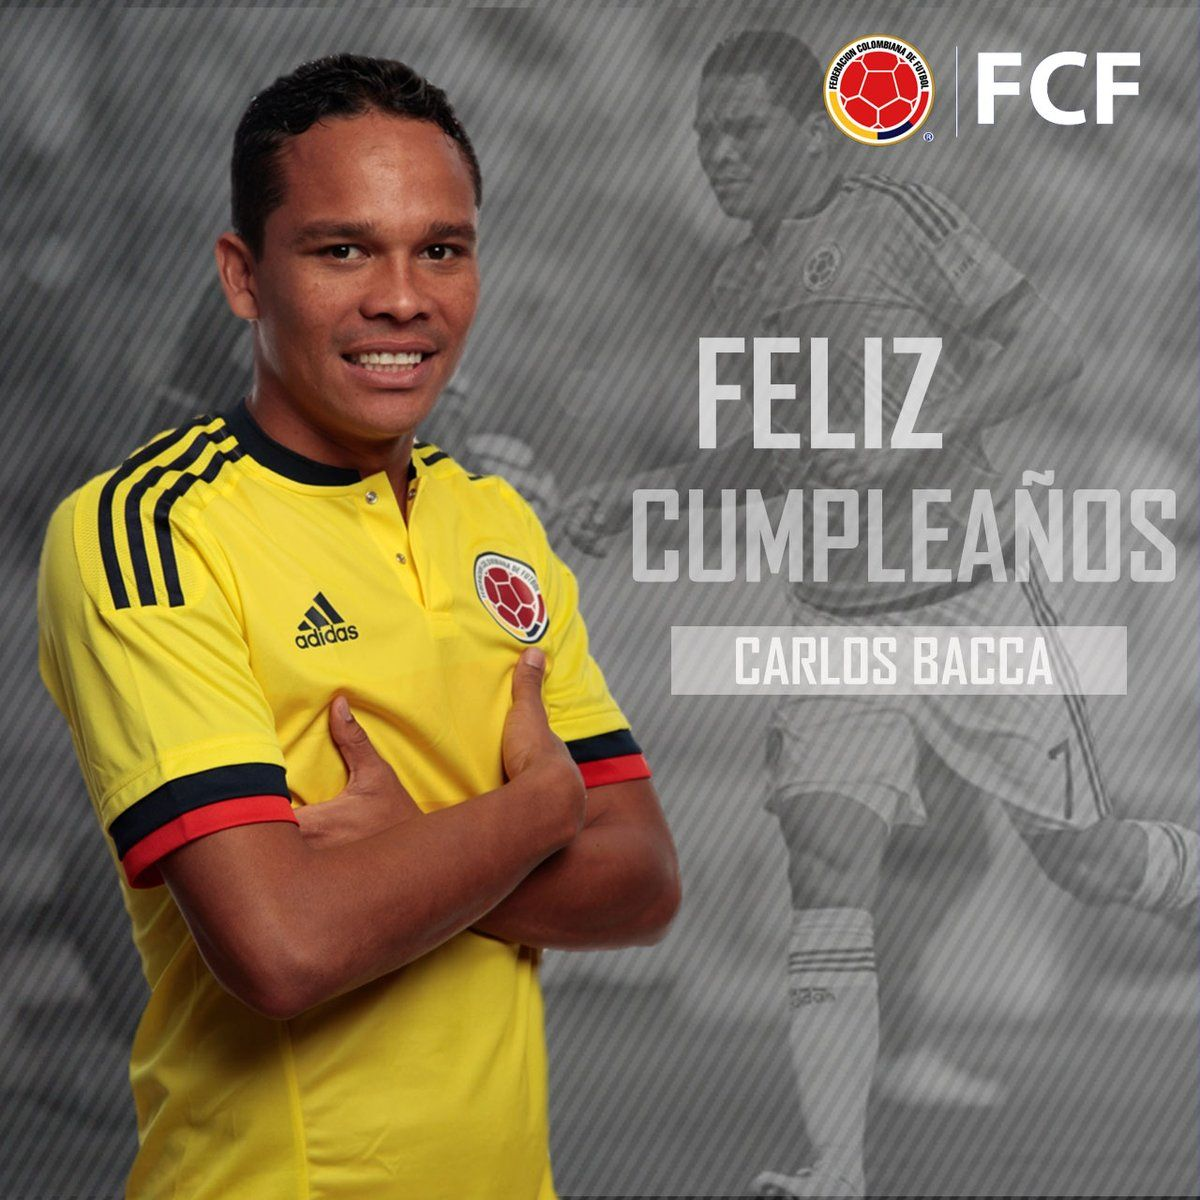 RT @ FCFSeleccionCol: ¡@carlos7bacca, felices 30! Será un año de grandes éxitos. https://t.co/wwftiHjGUC